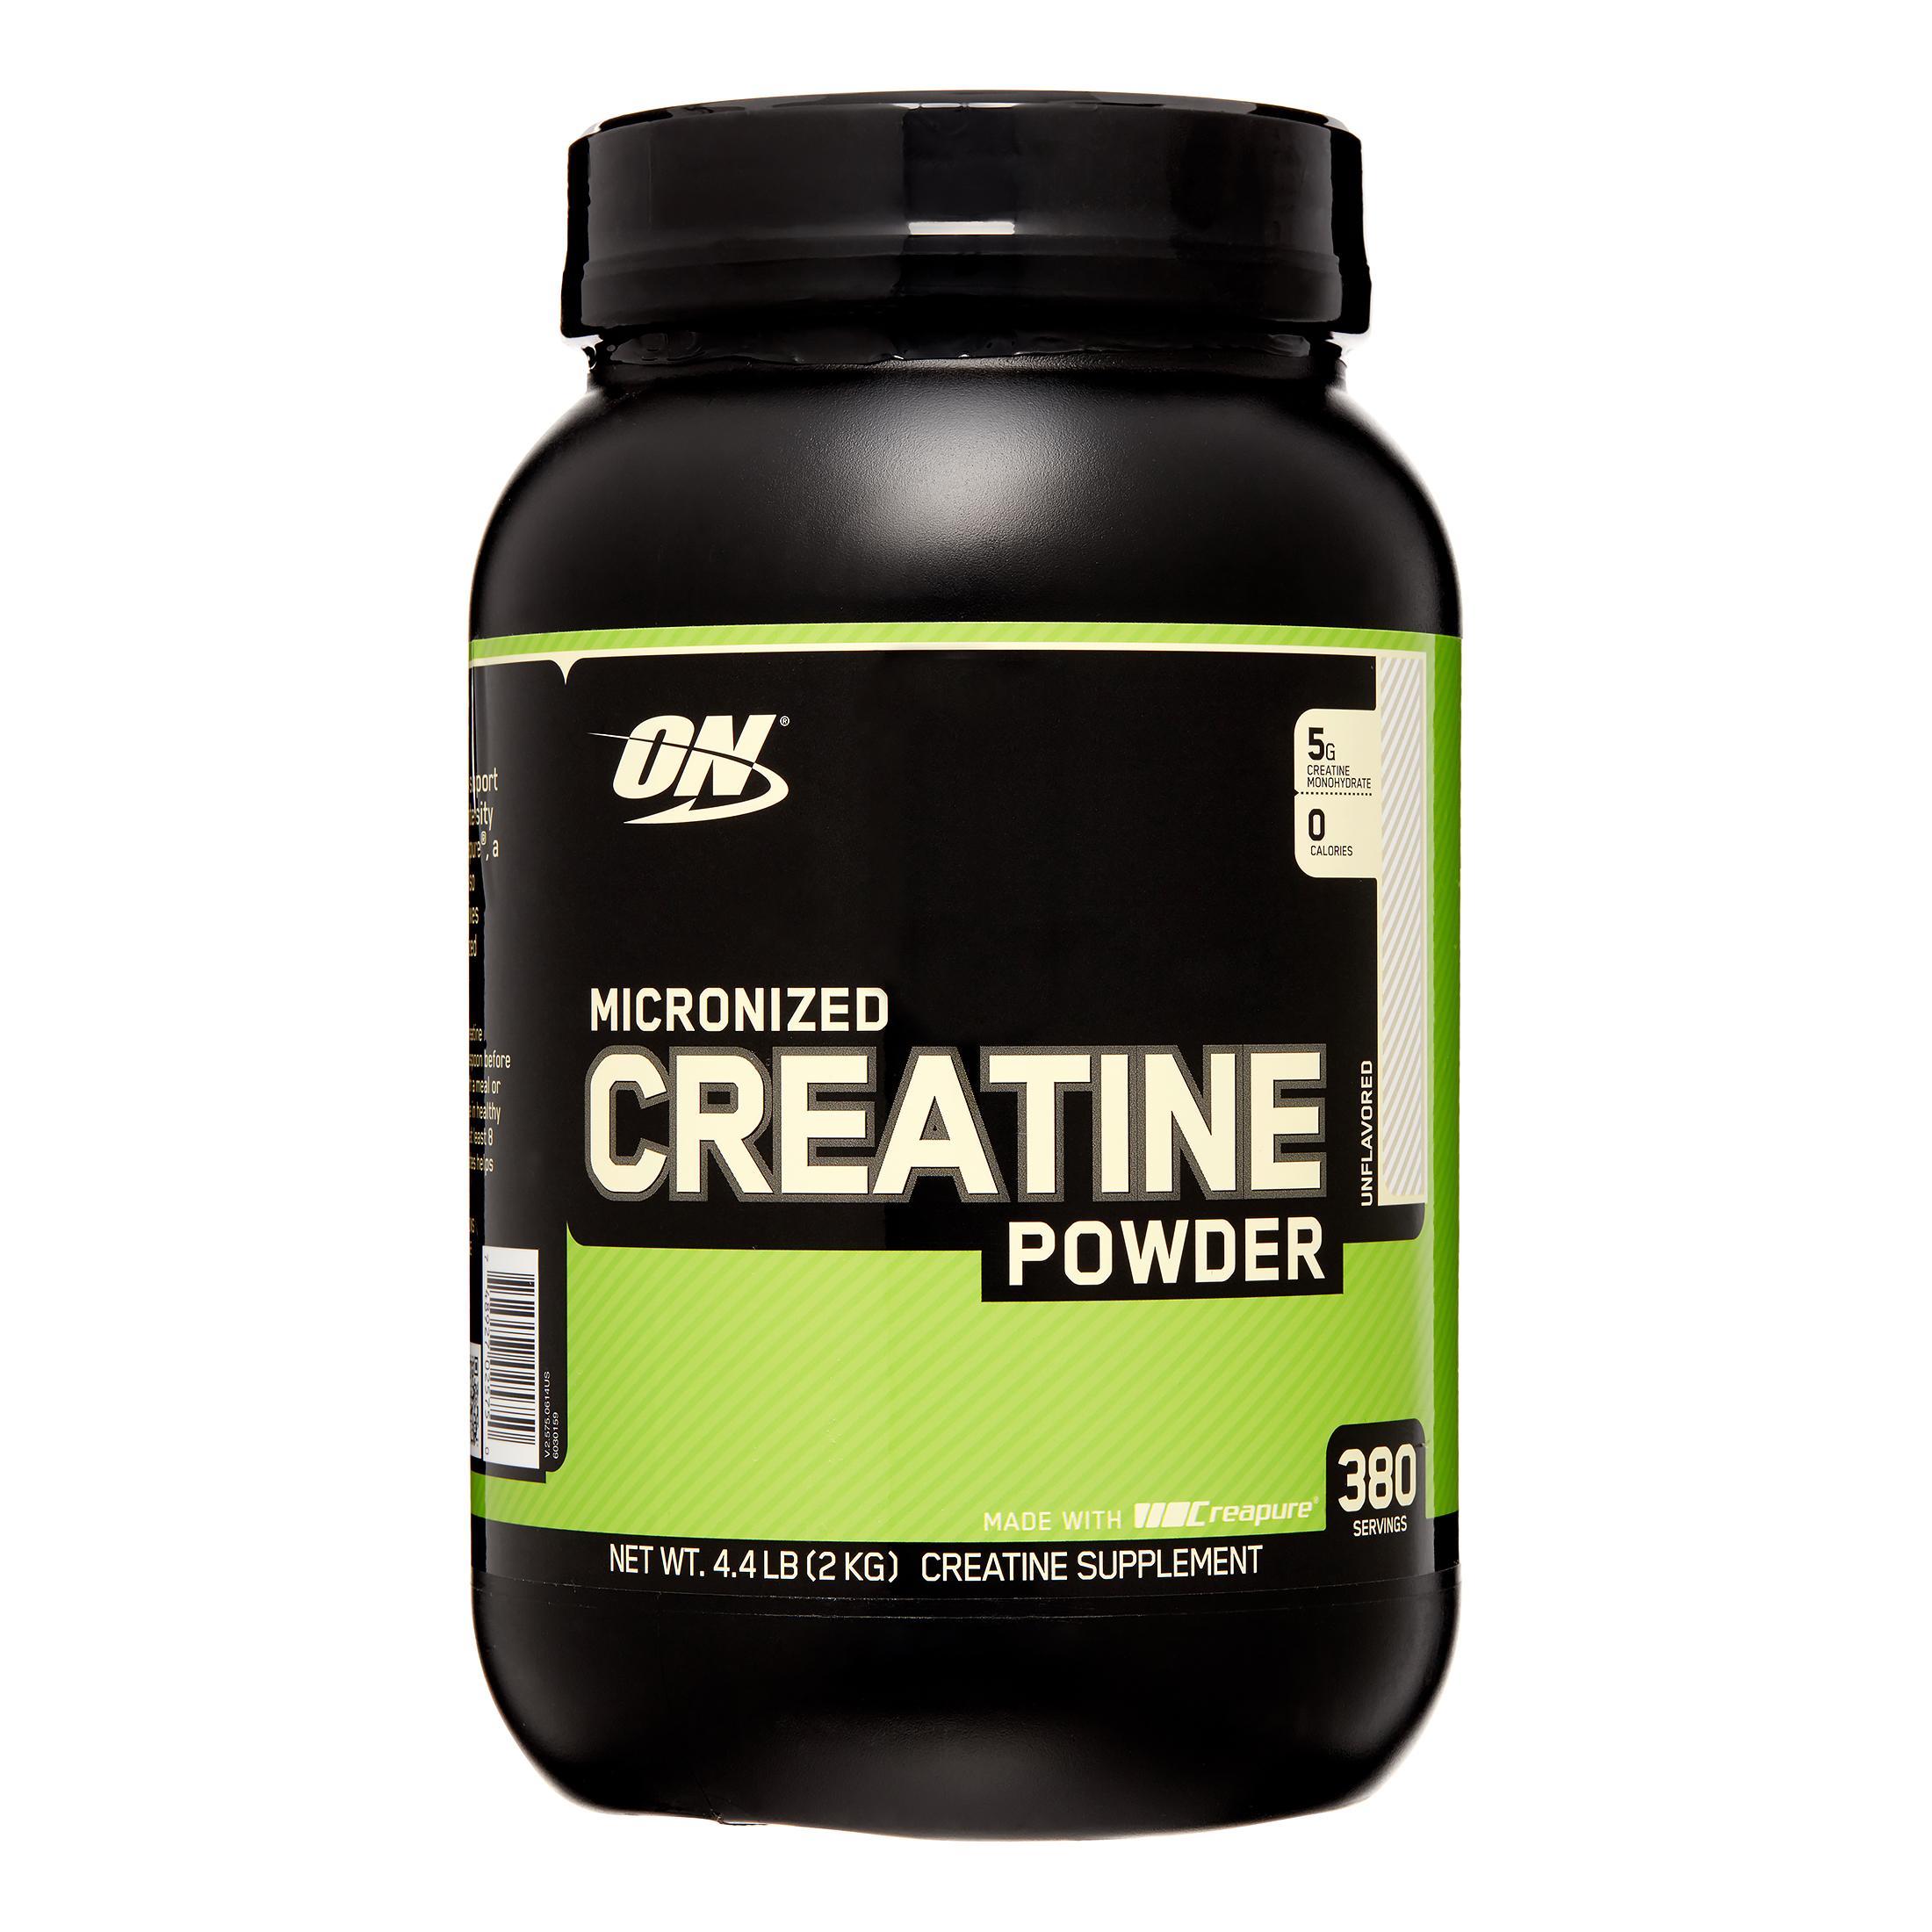 Optimum Nutrition Micronized Creatine Powder, 380 Servings